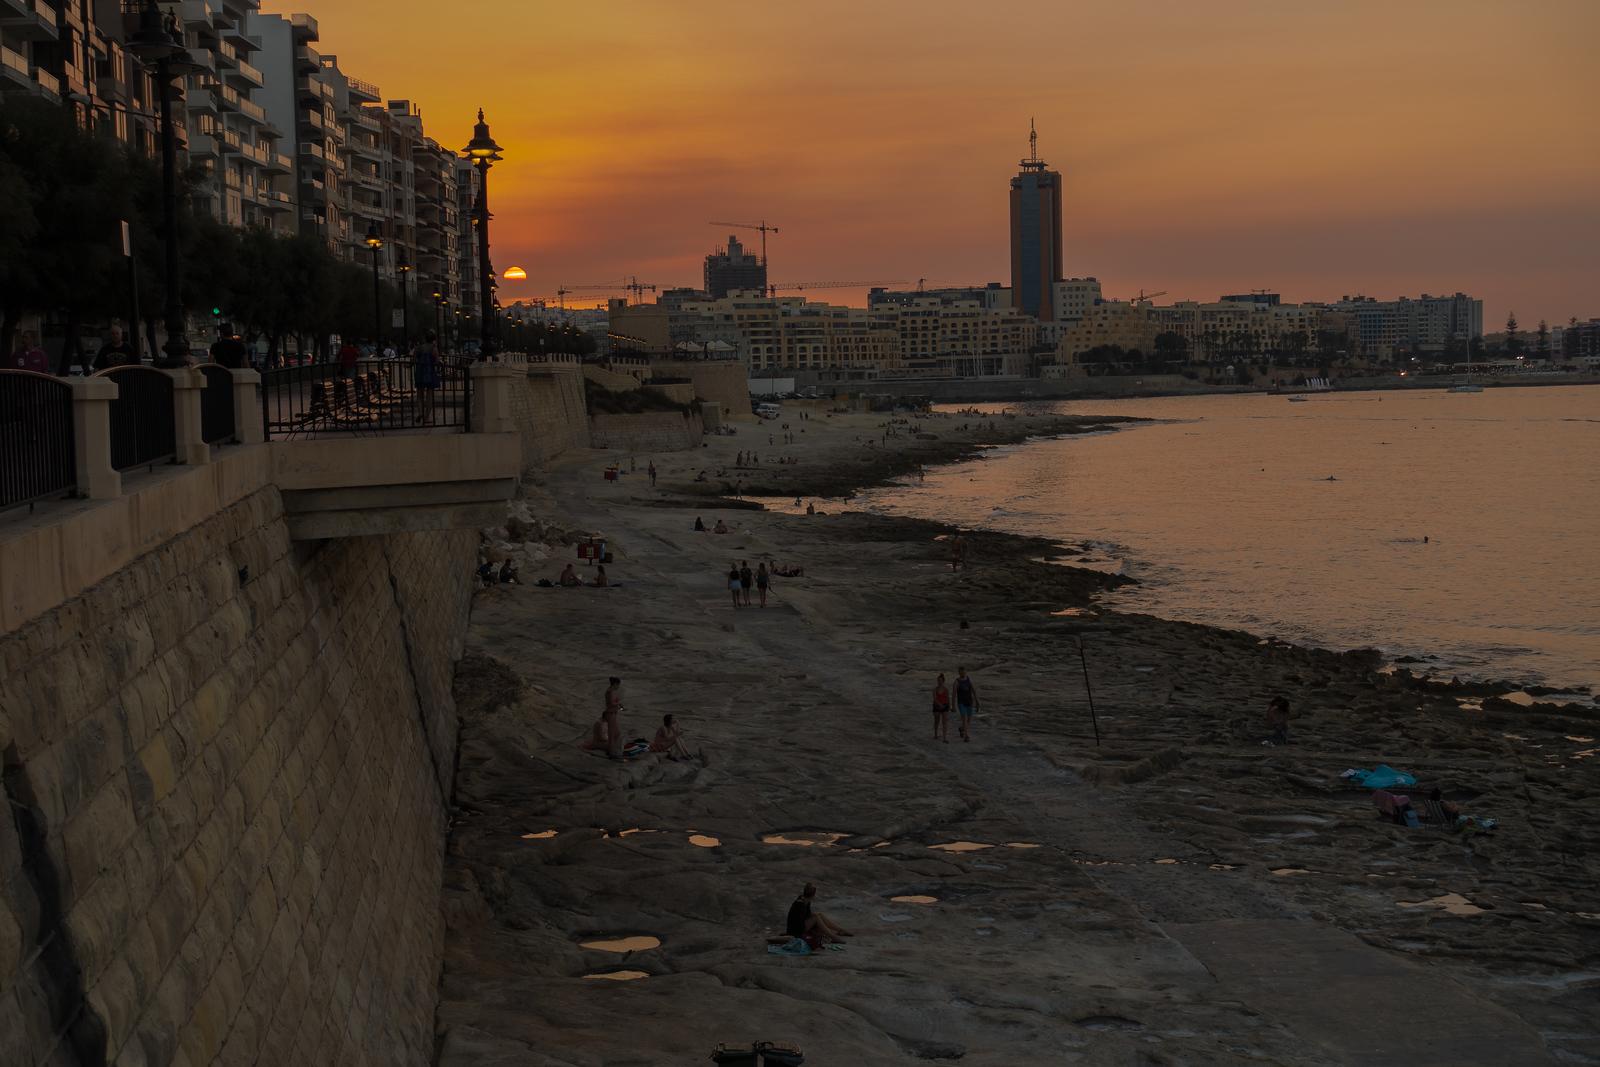 Malta Pictures - Sunset in Sliema